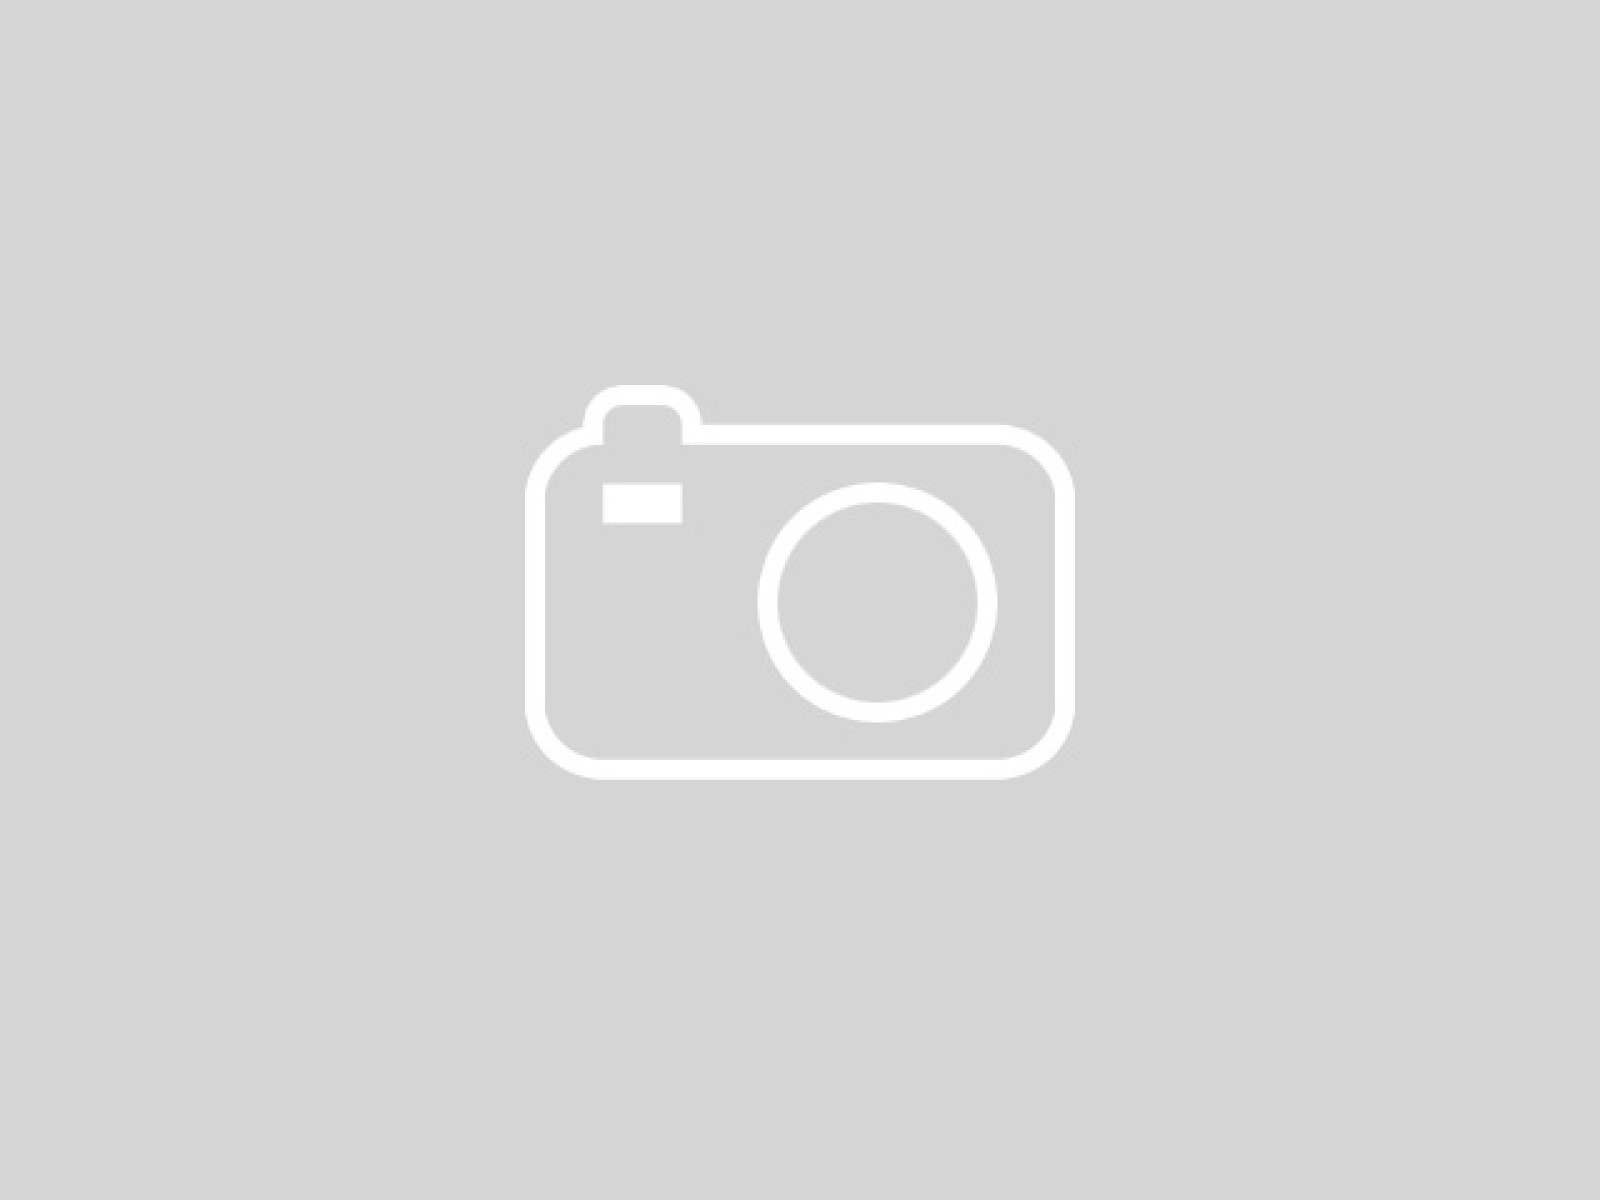 Certified Pre Owned 2018 Mercedes Benz Gle Amg Gle 63 S 4matic Suv Suv In Newport Beach Mp45840 Fletcher Jones California